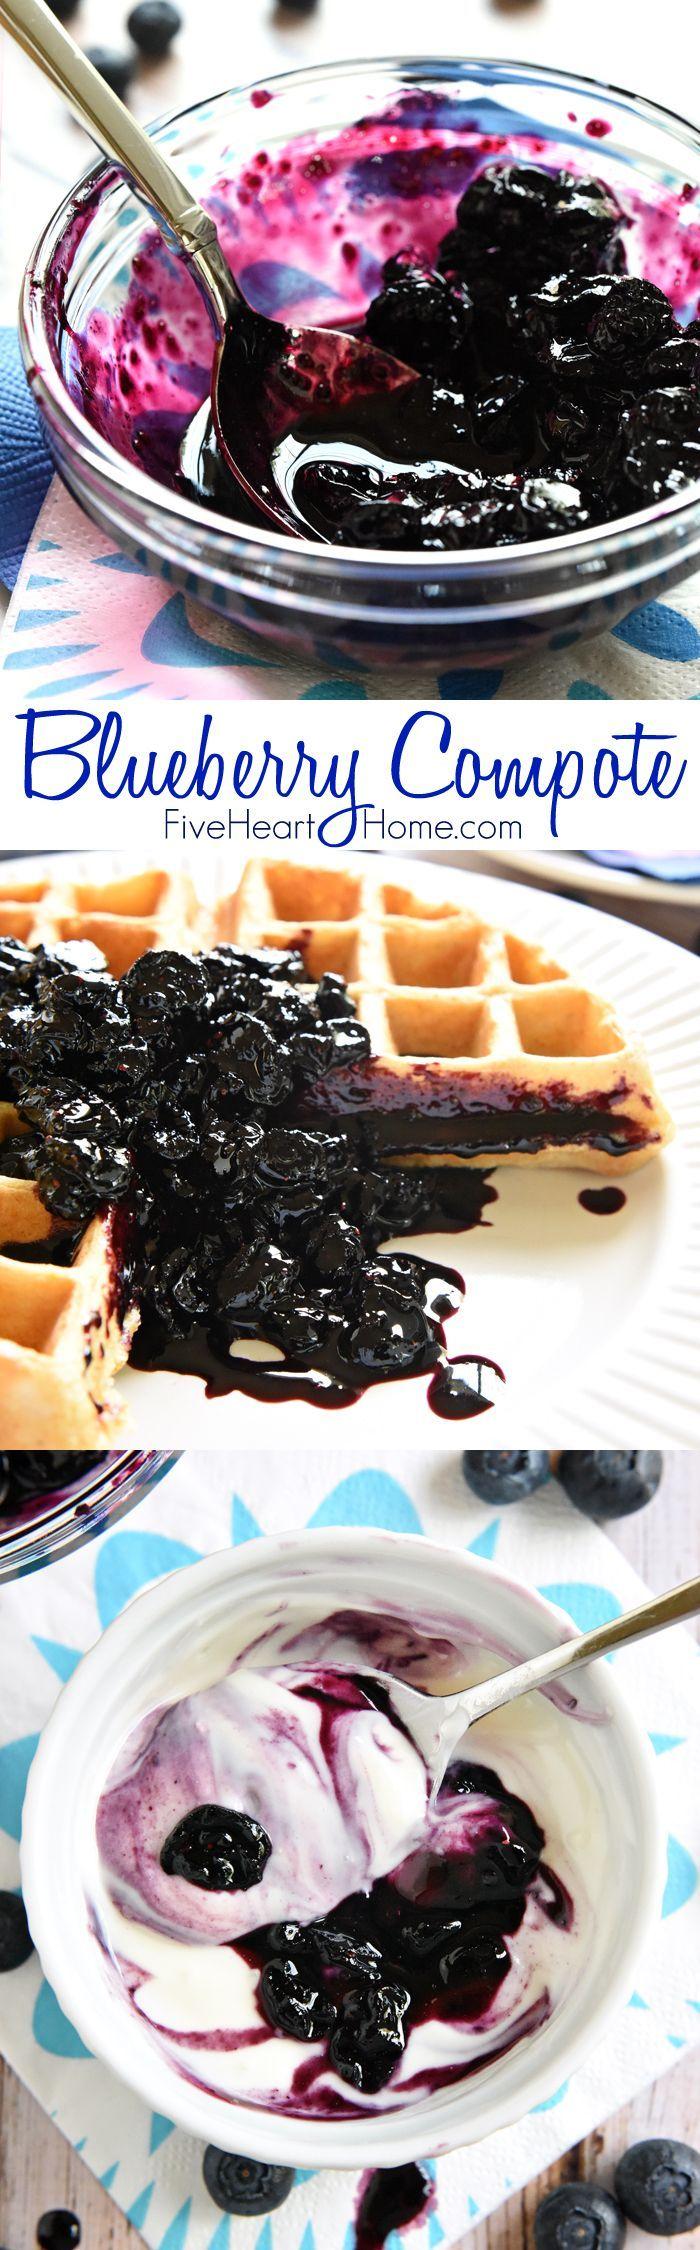 ... maple syrup and delicious over waffles, pancakes, pound cake, yogurt